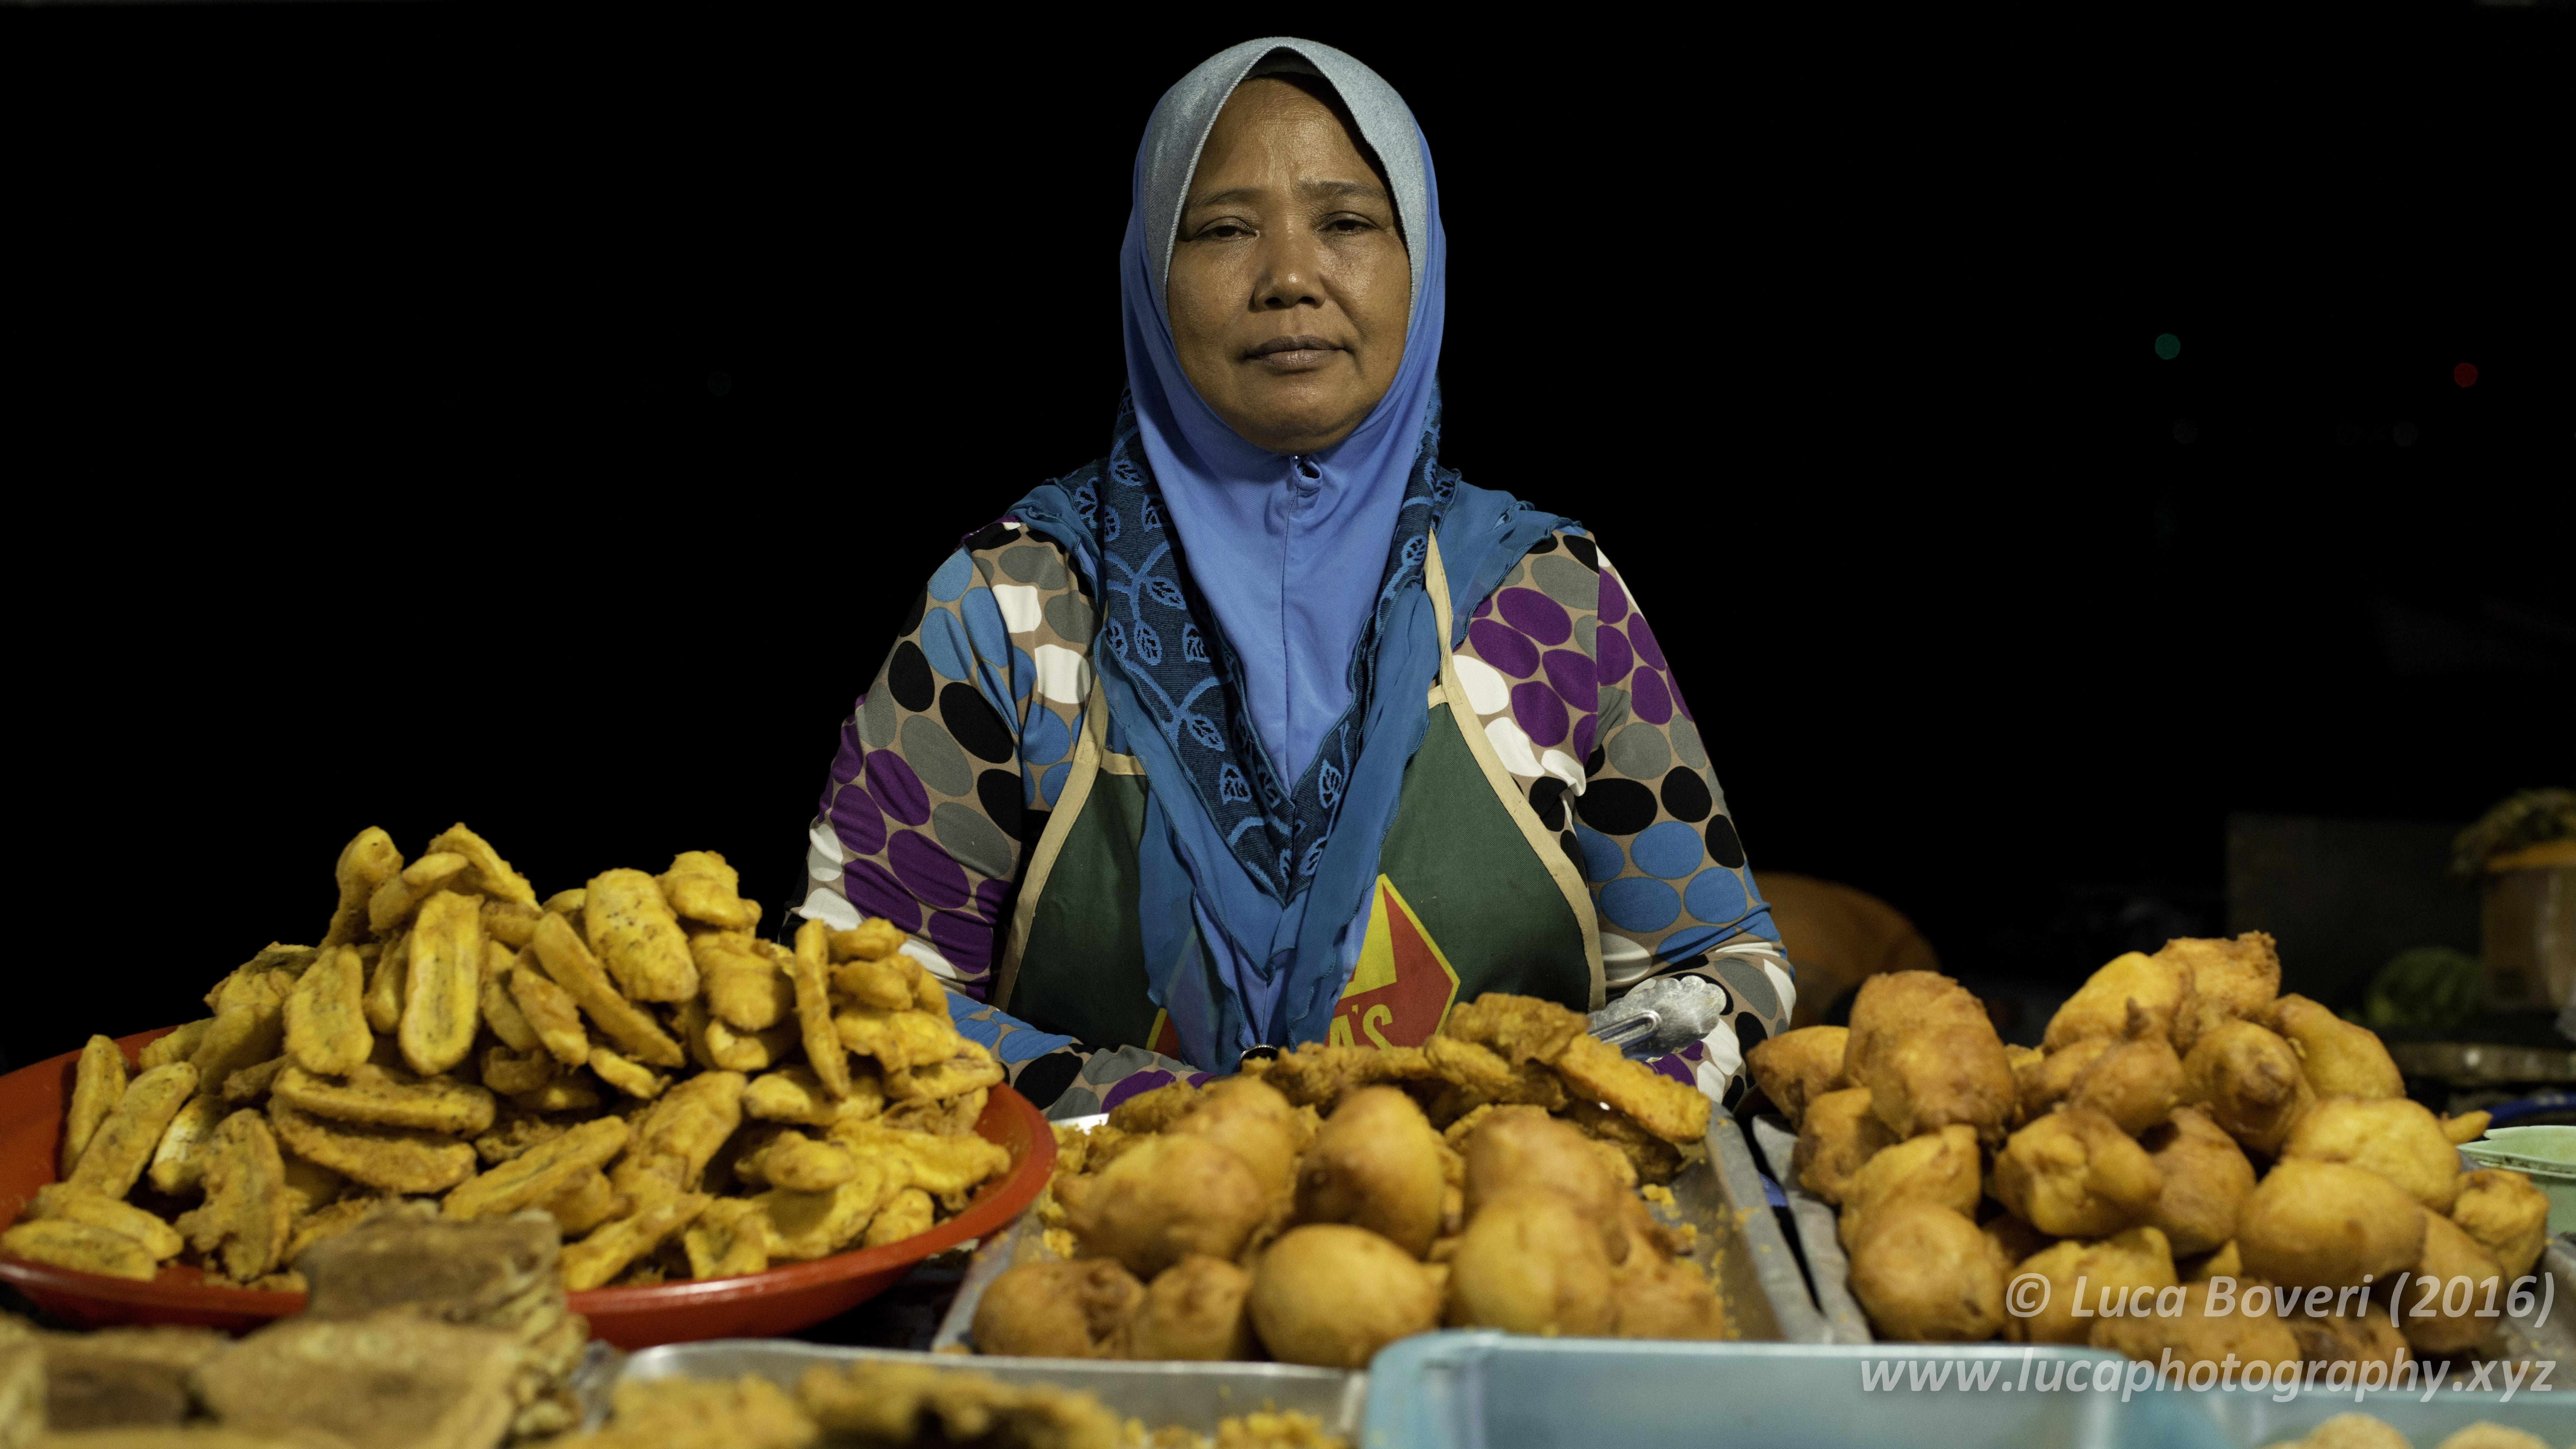 Market in Kita Kinabalu. @lucaboveri